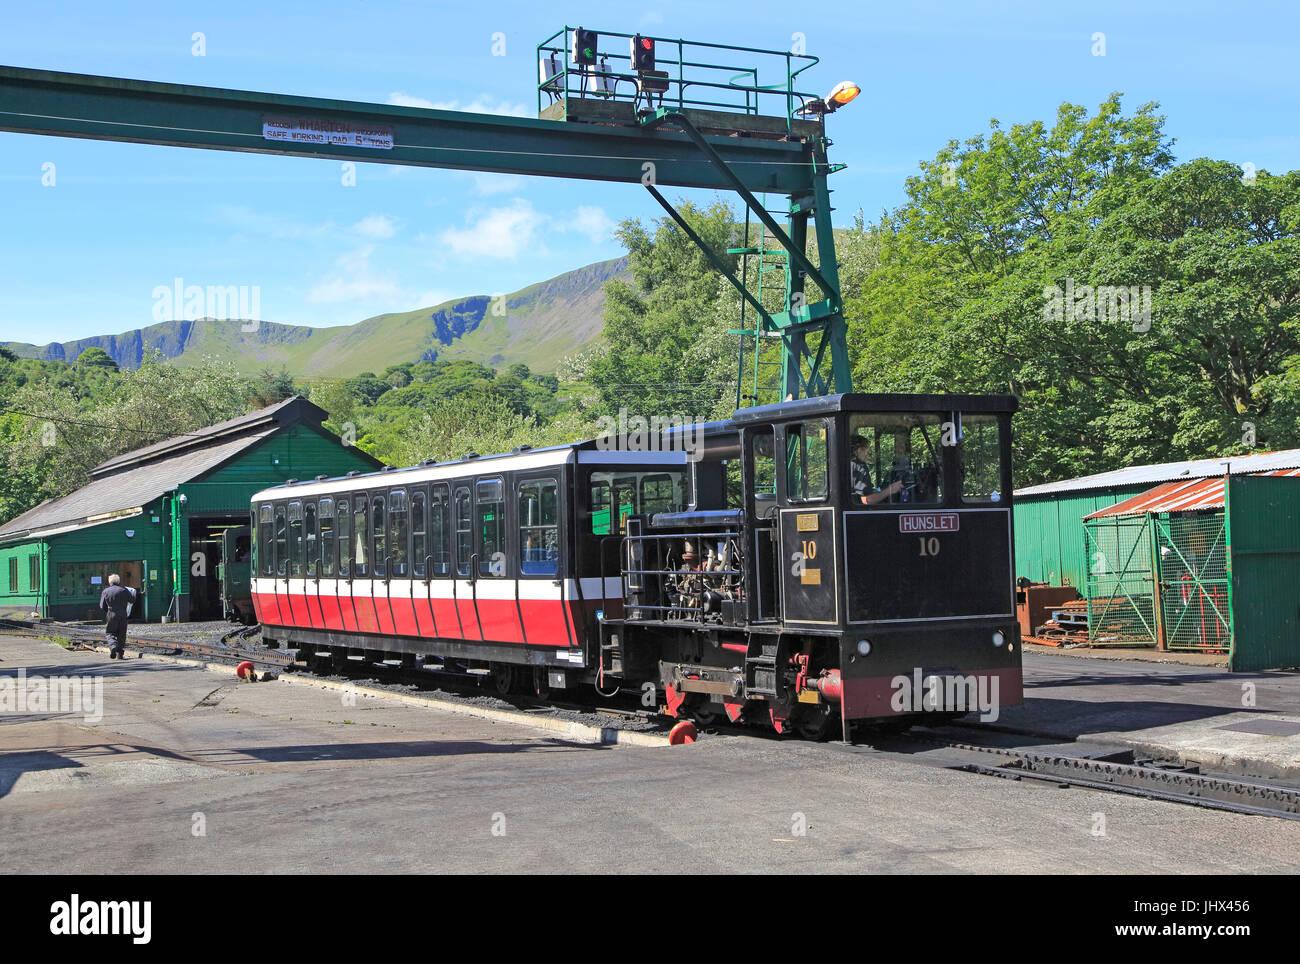 Snowdon Mountain railway, Llanberis, Gwynedd, Snowdonia, north Wales, UK - Stock Image